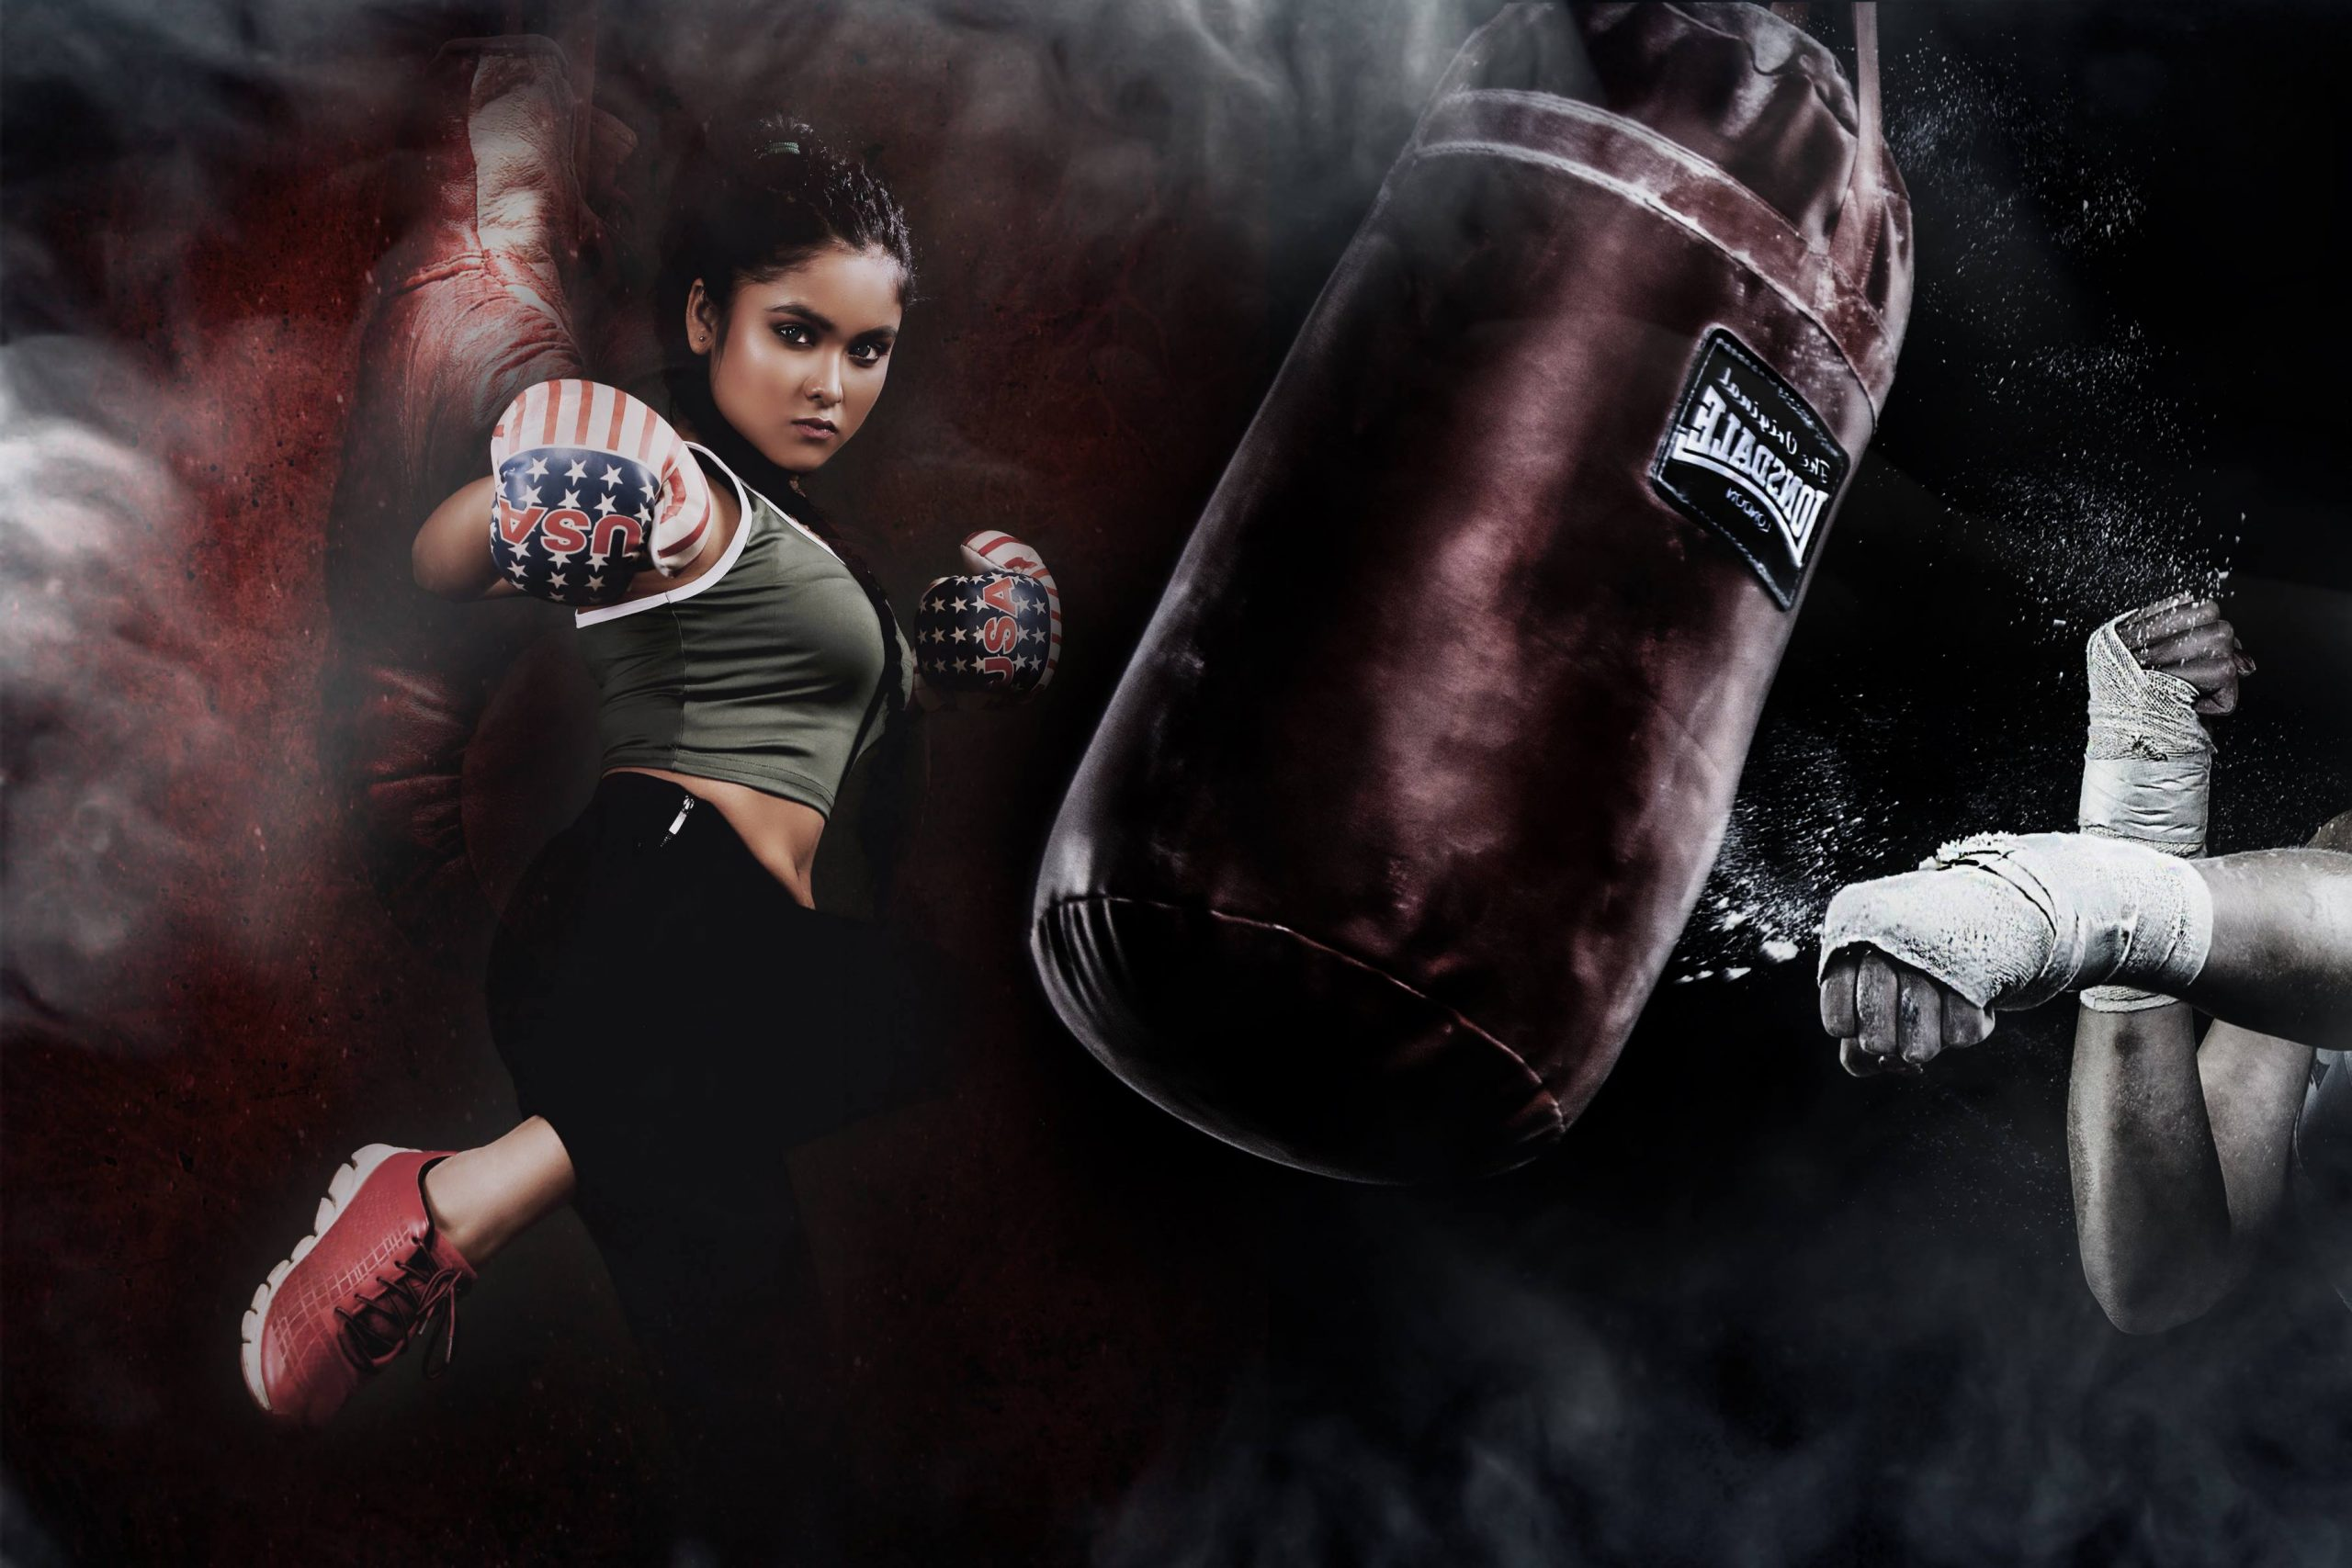 A boxer girl punching